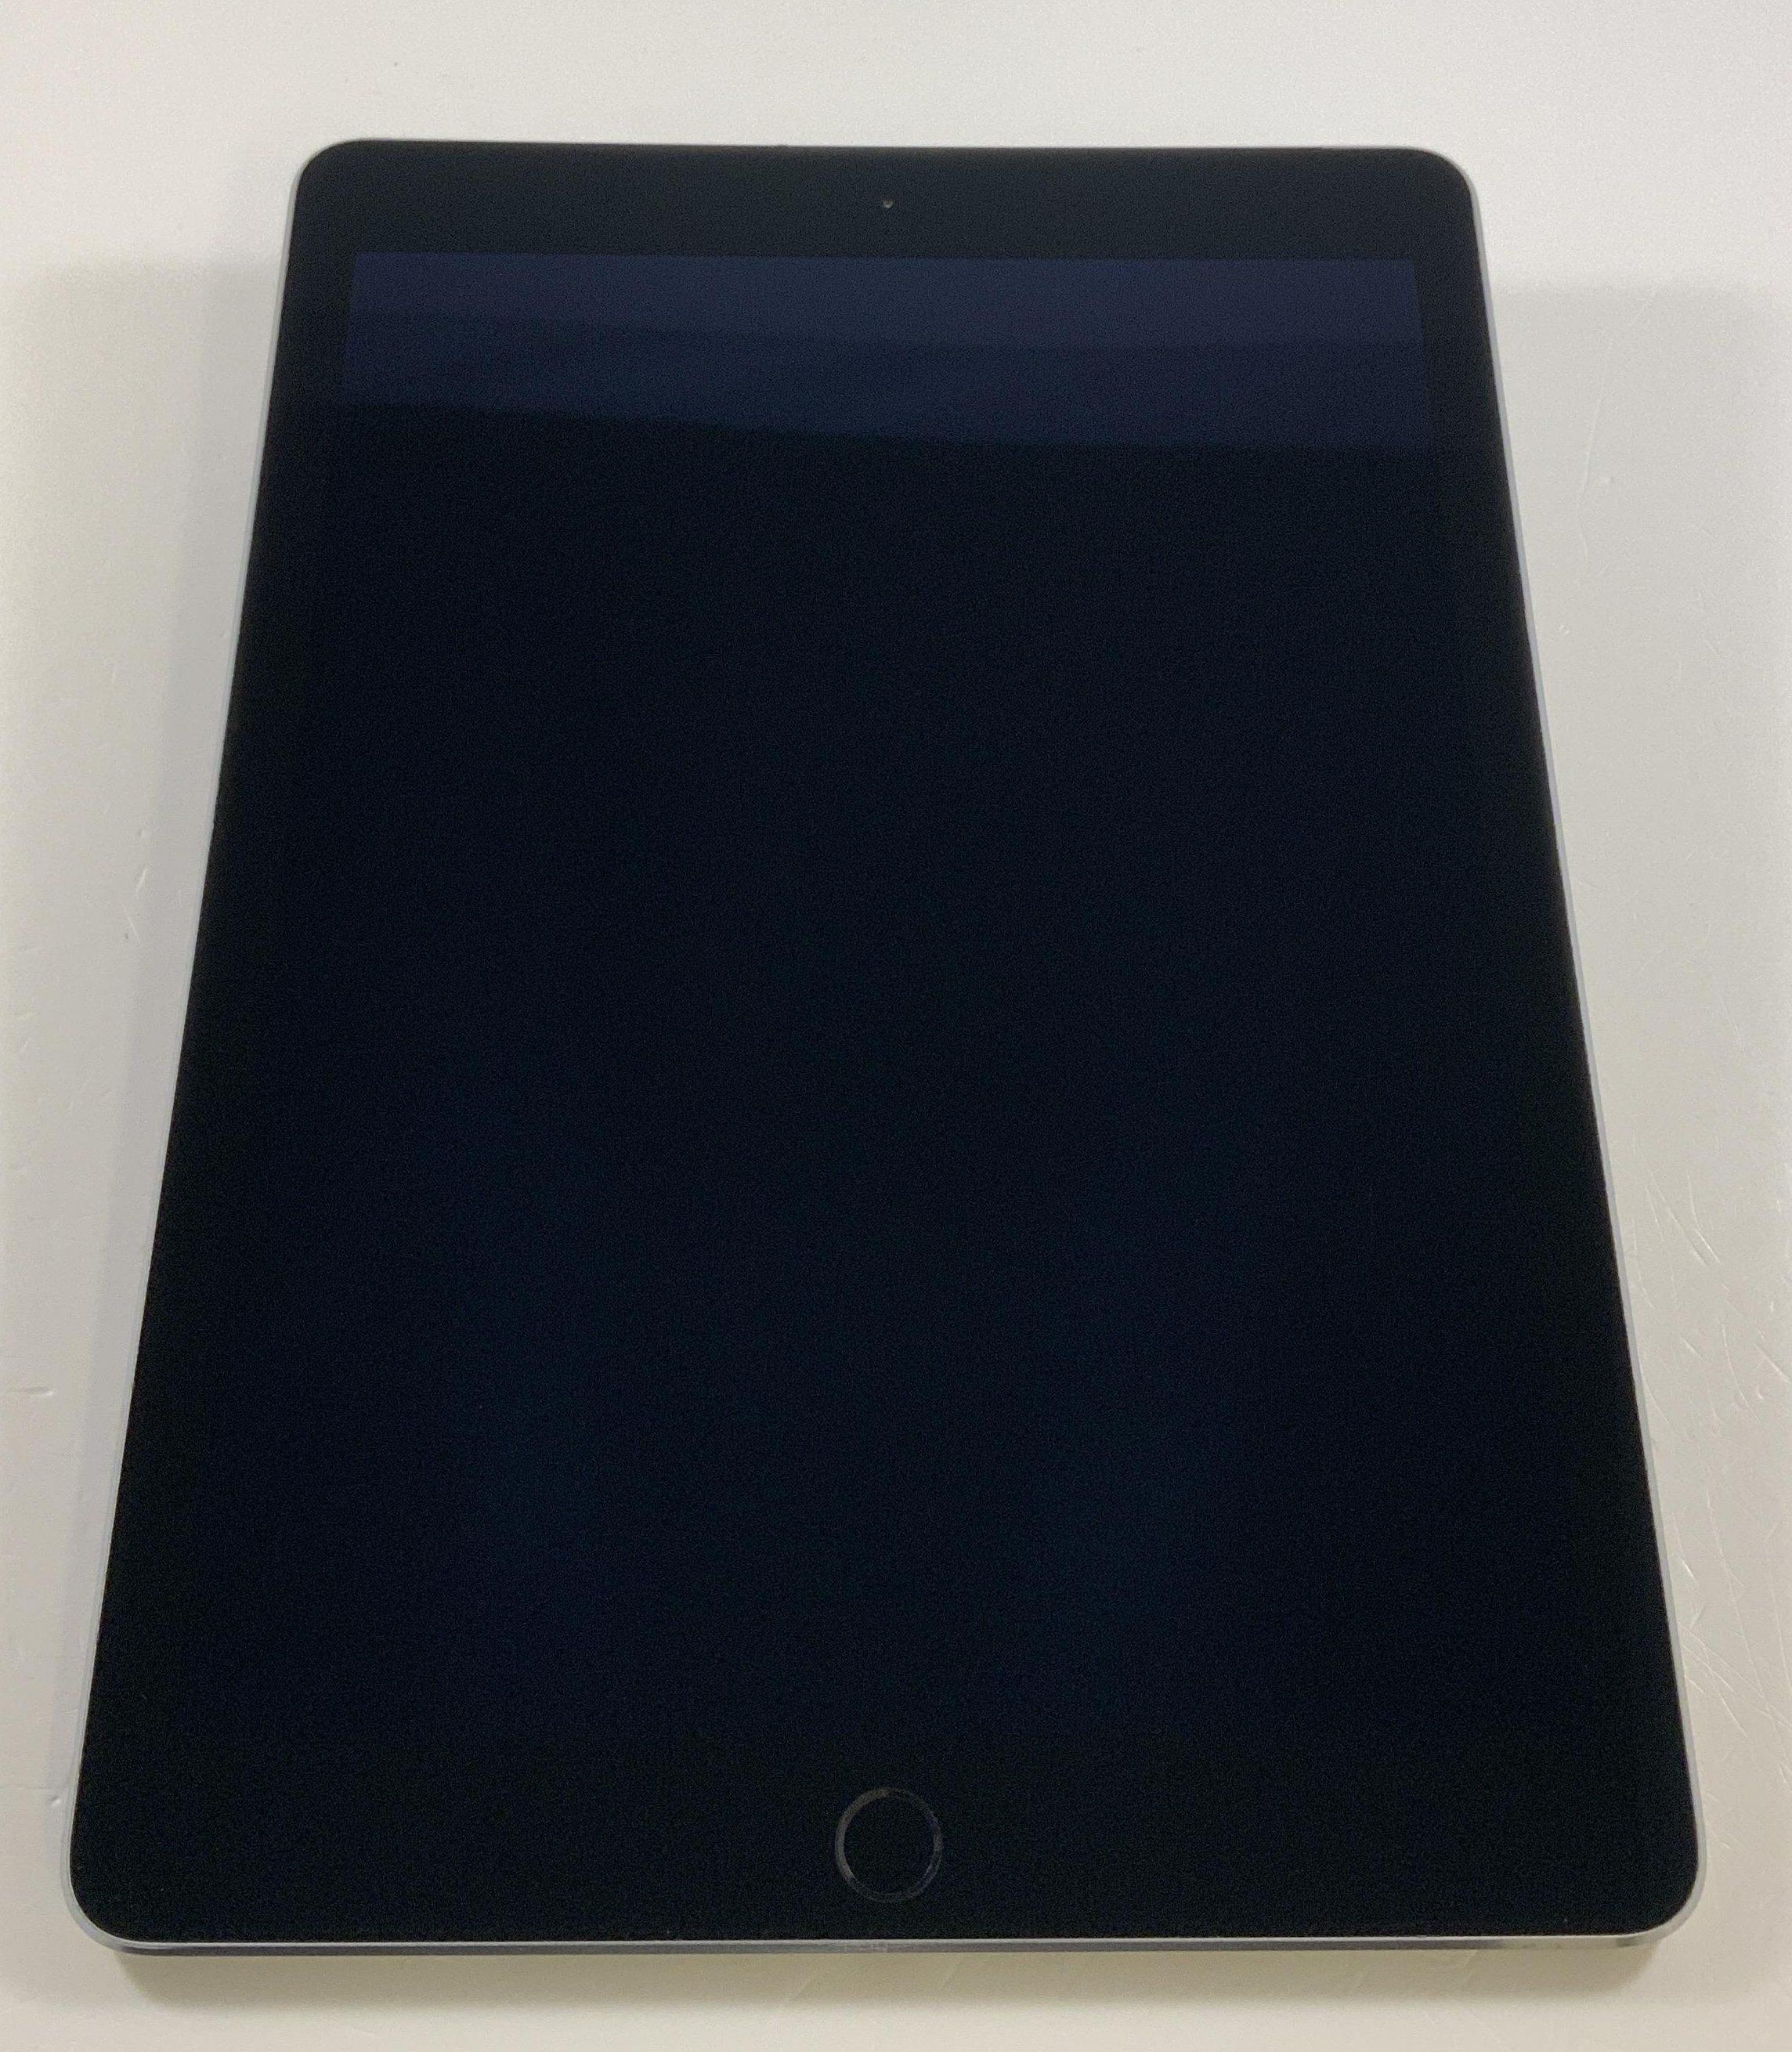 iPad Air 2 Wi-Fi + Cellular 64GB, 64GB, Space Gray, obraz 1